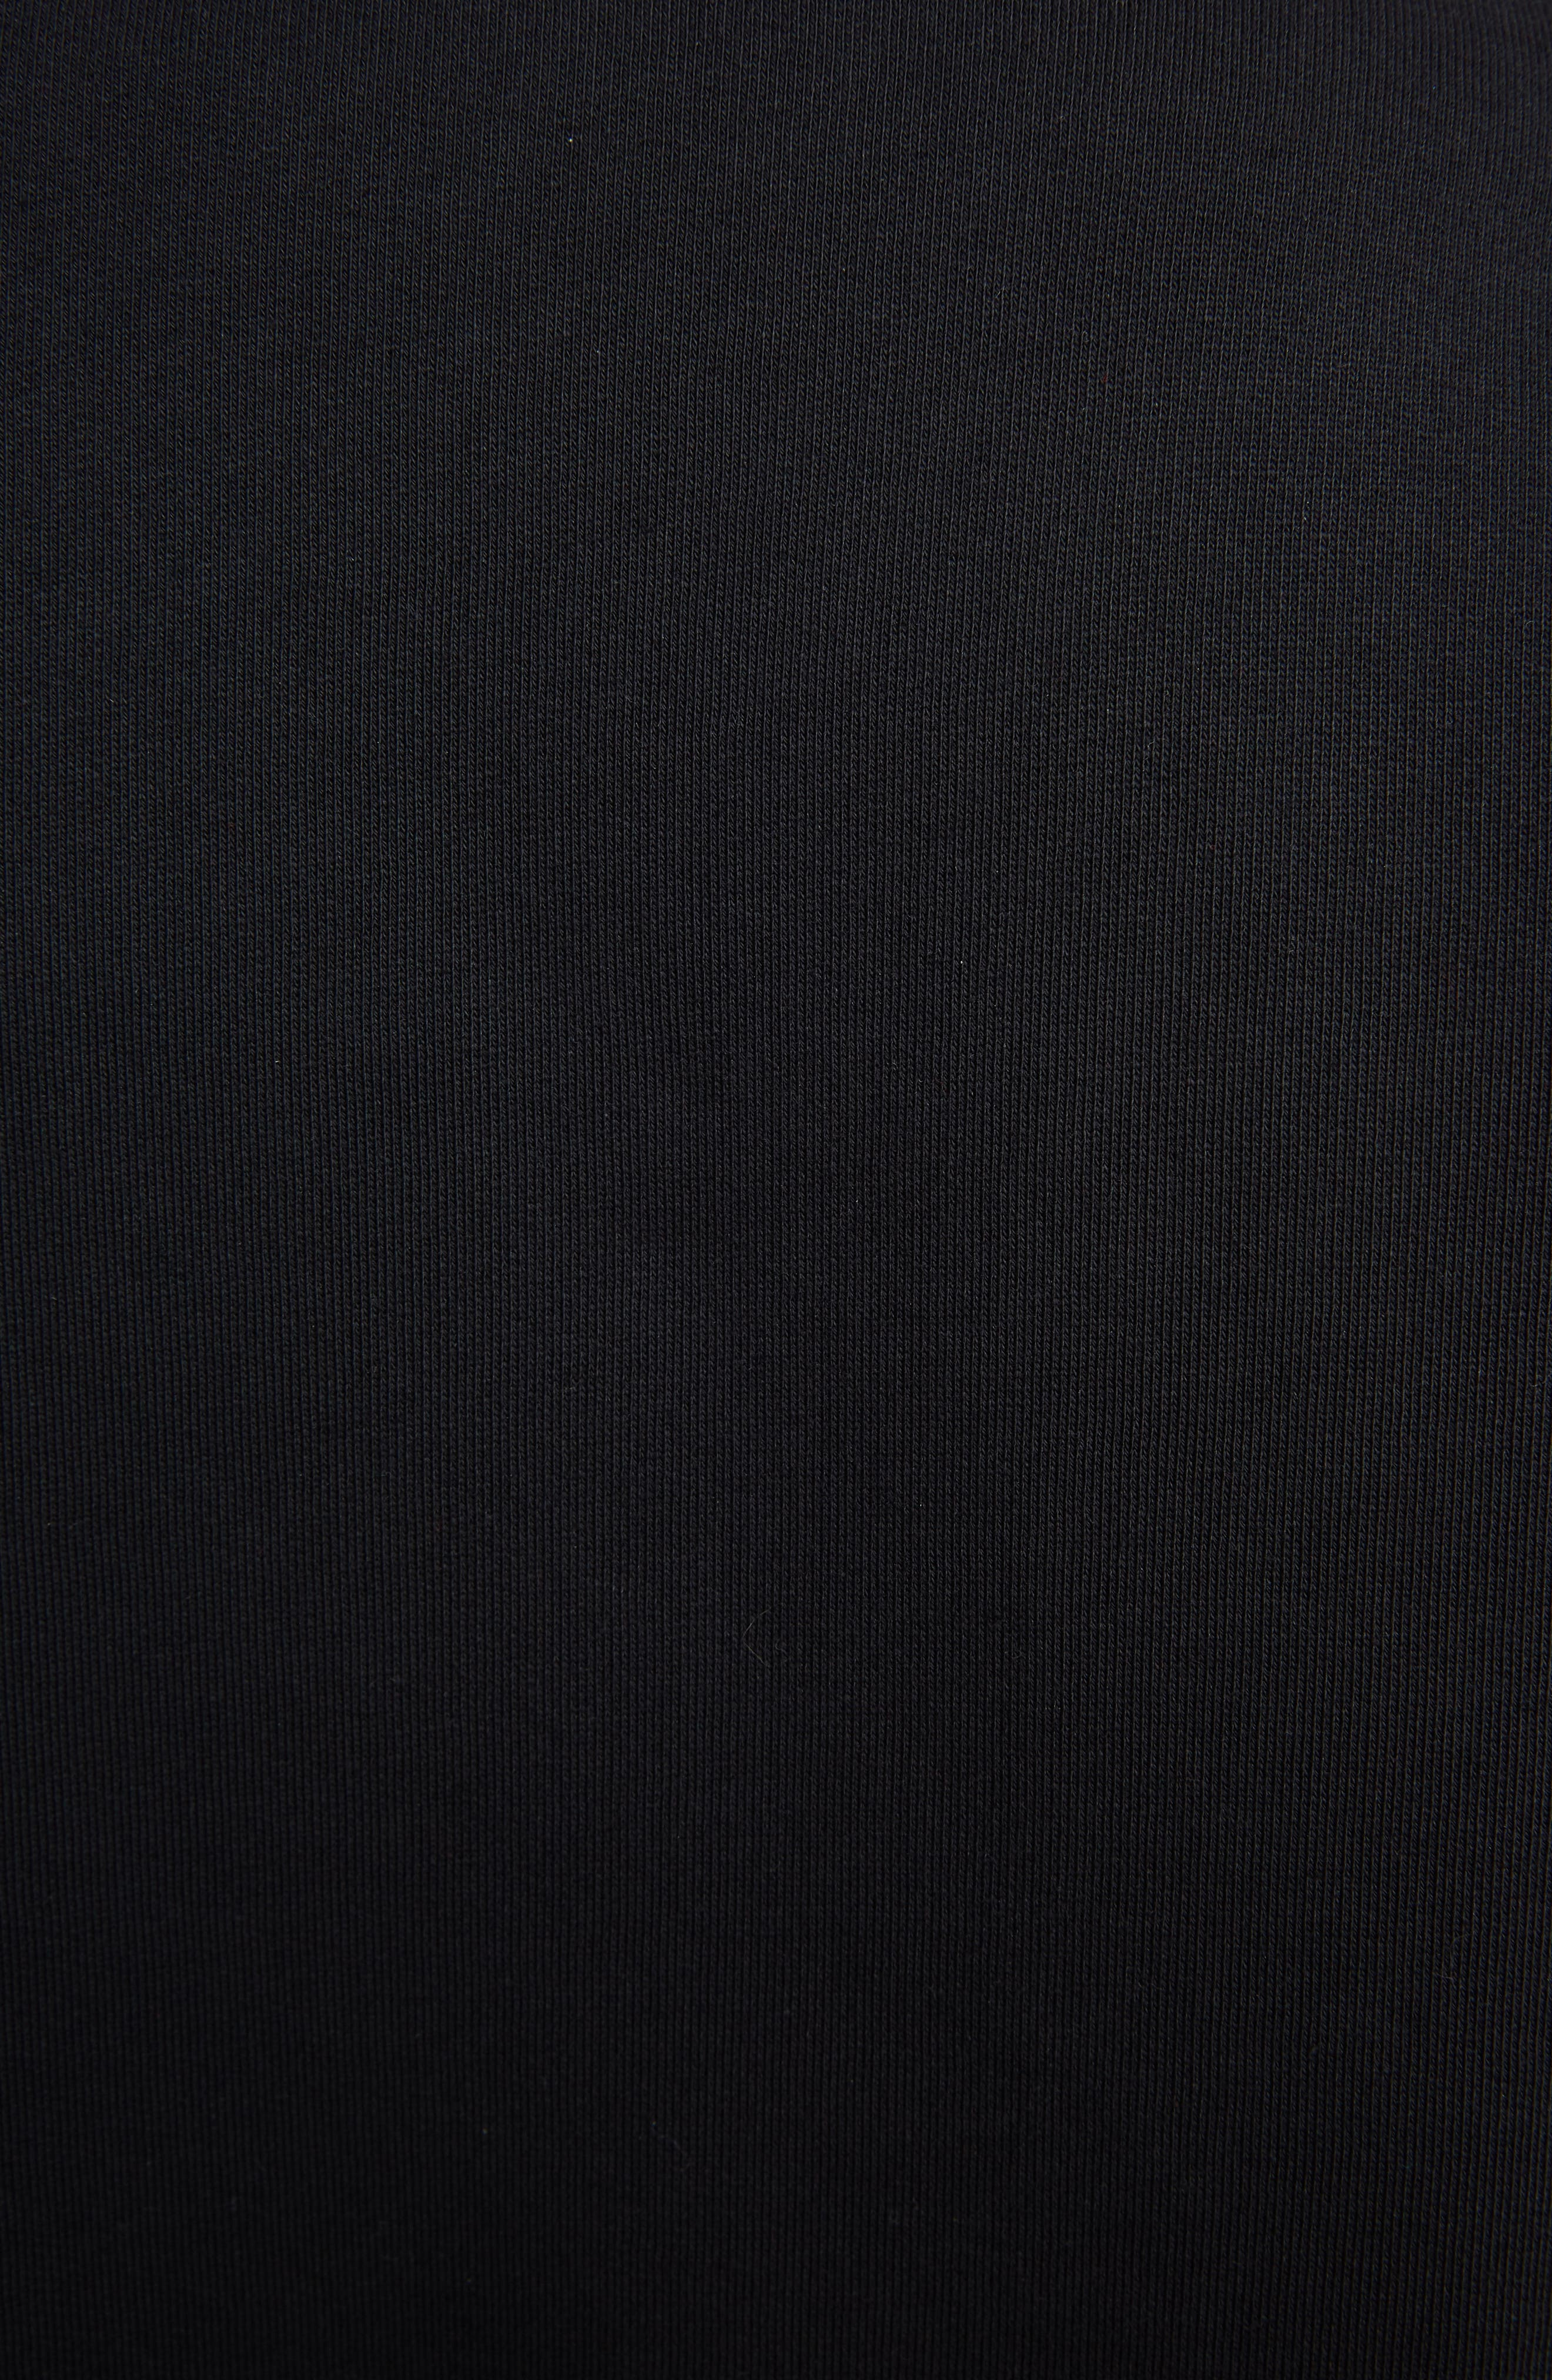 Tiger Relax Sweatshirt,                             Alternate thumbnail 5, color,                             BLACK